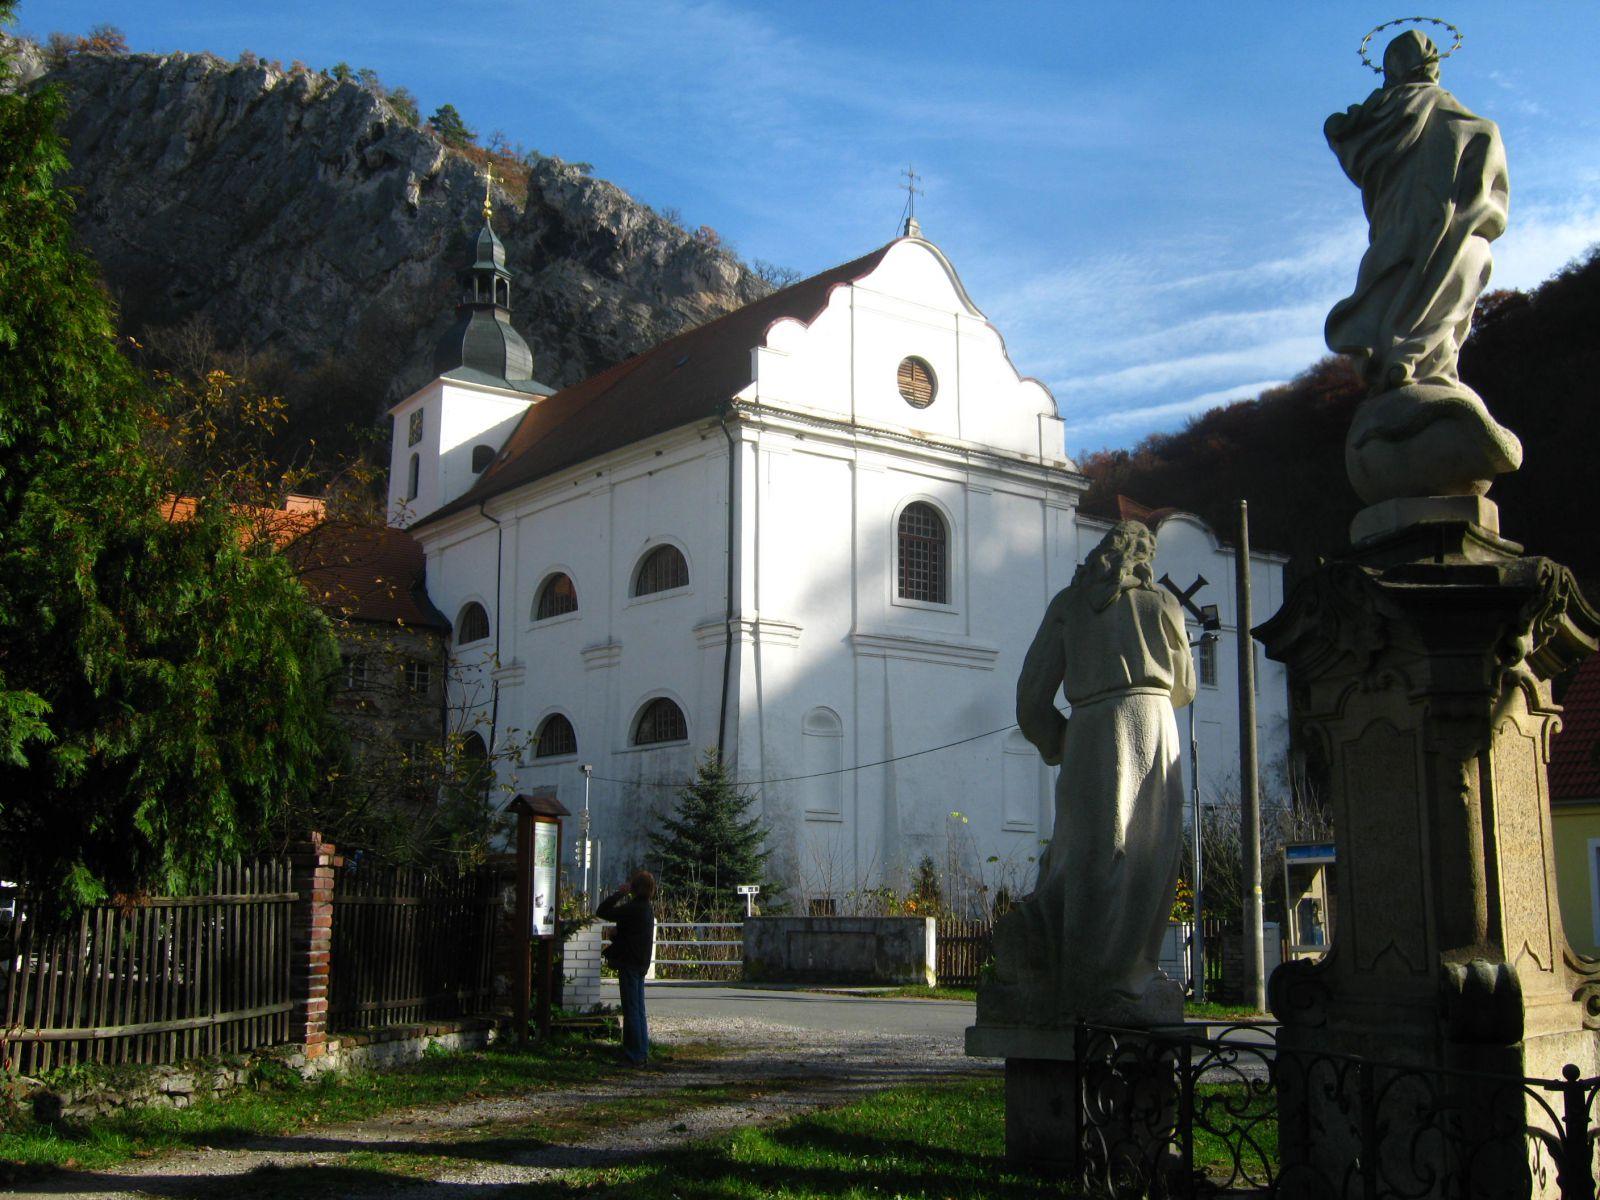 Svaty Jan Pod Skalou